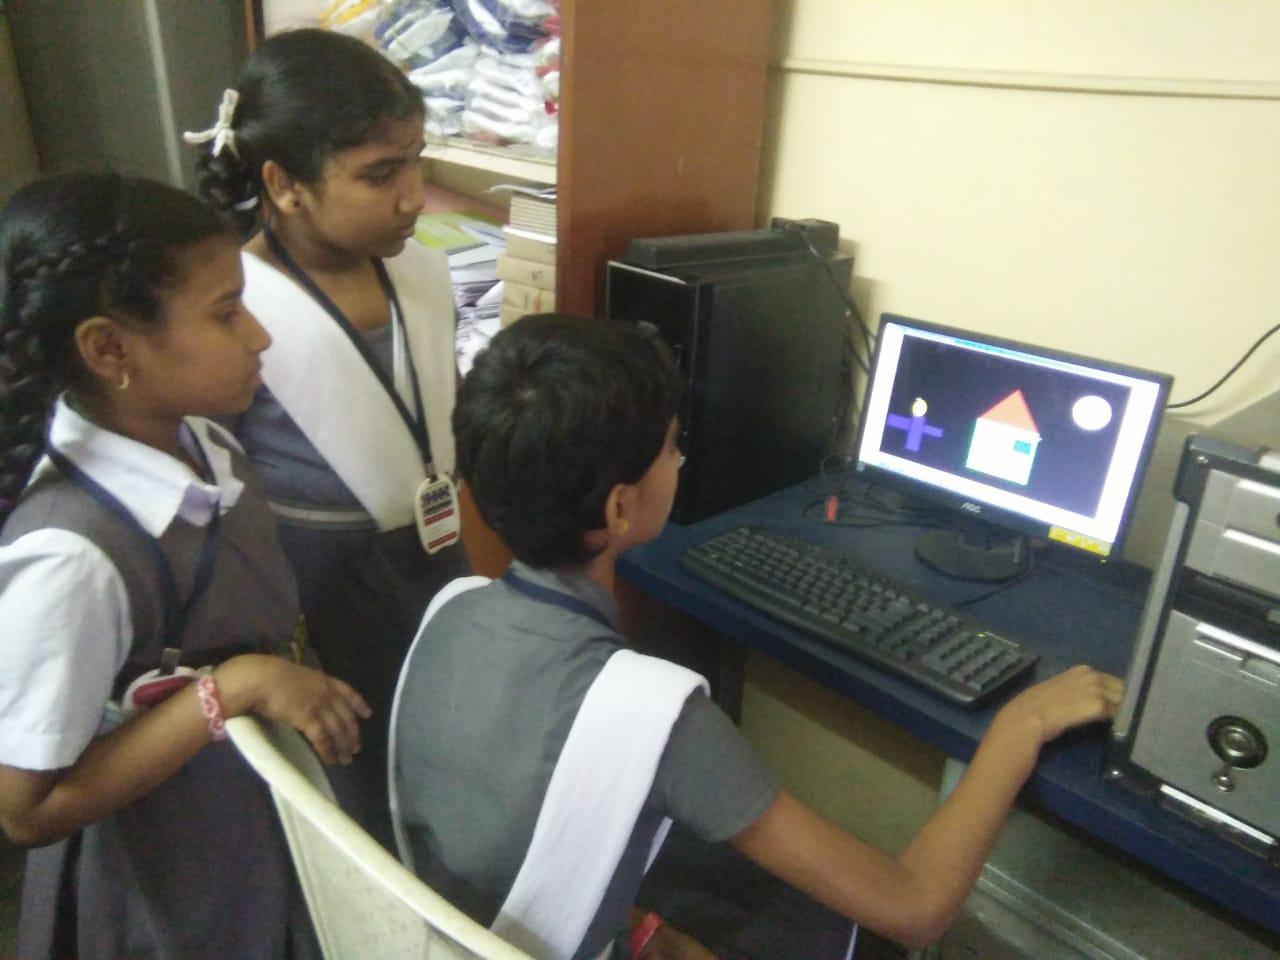 2020-07-05-KidpowerIndia_Educateagirlchildinanintegratedenvironment_2.jpg